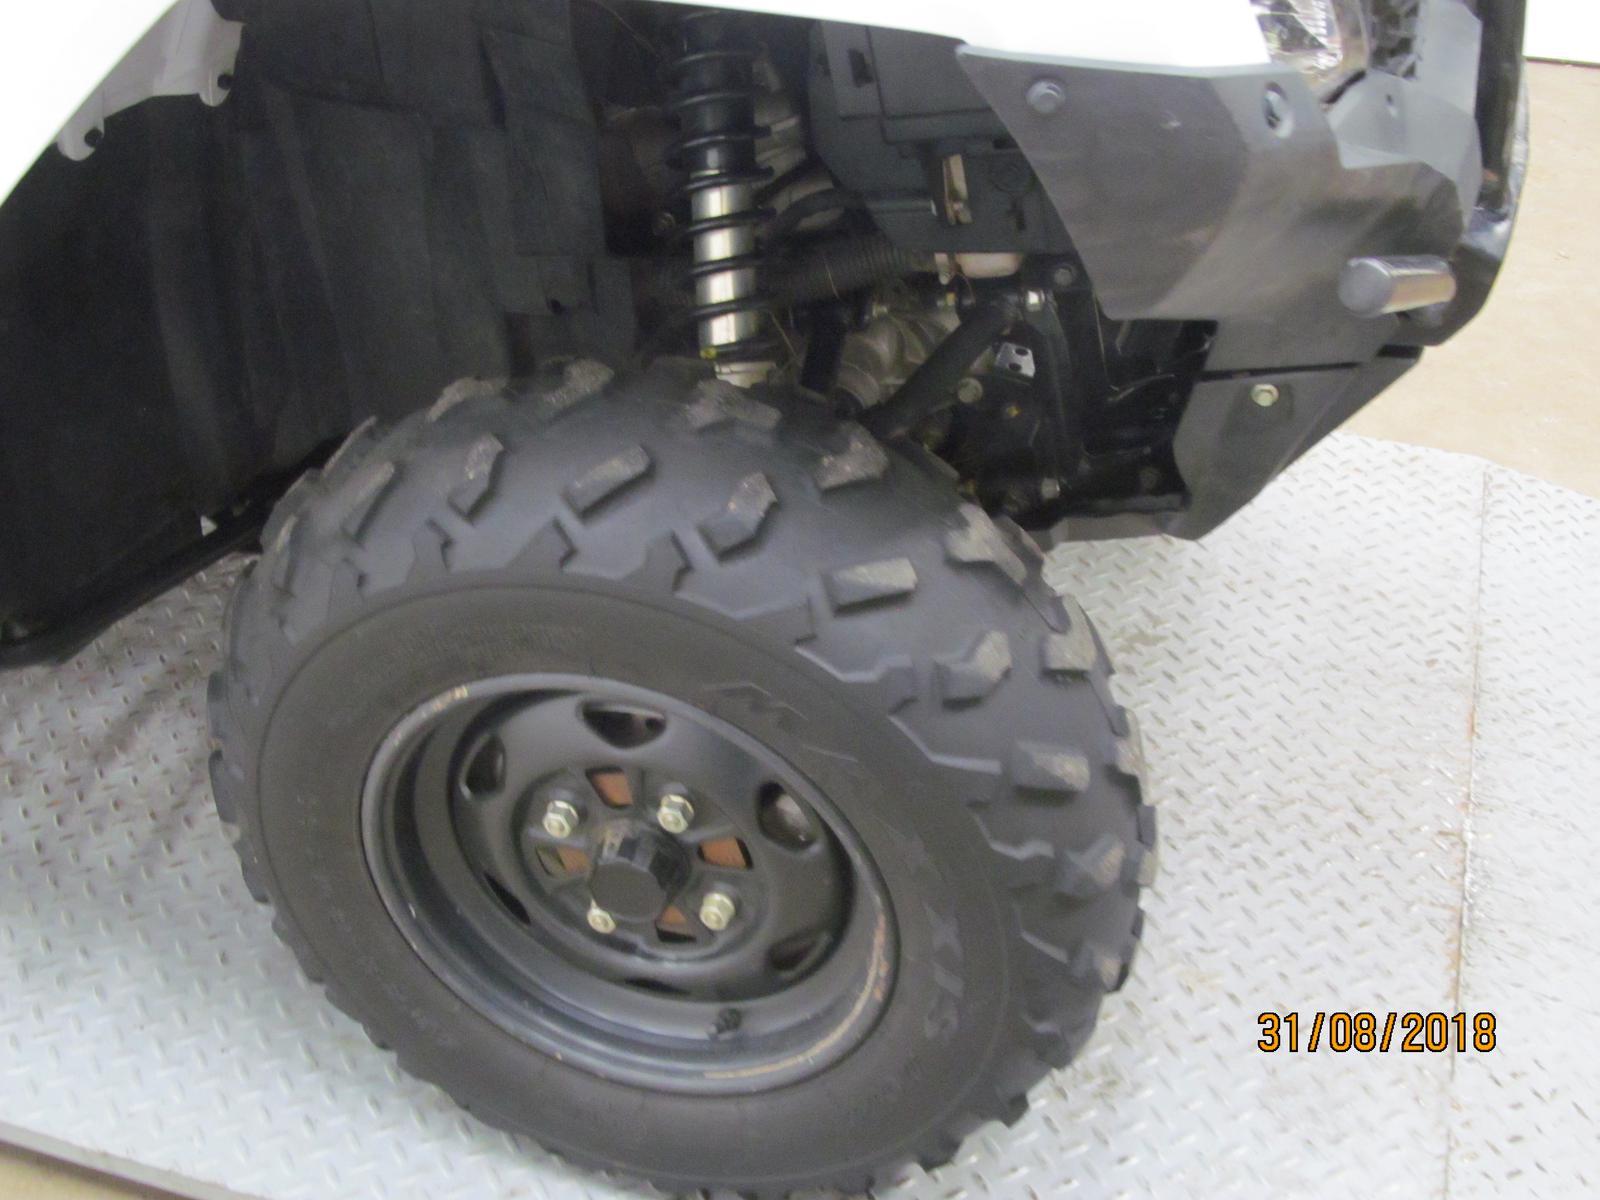 New Standard Black Seat Cover 2004-2006 Honda TRX350 Rancher ATV